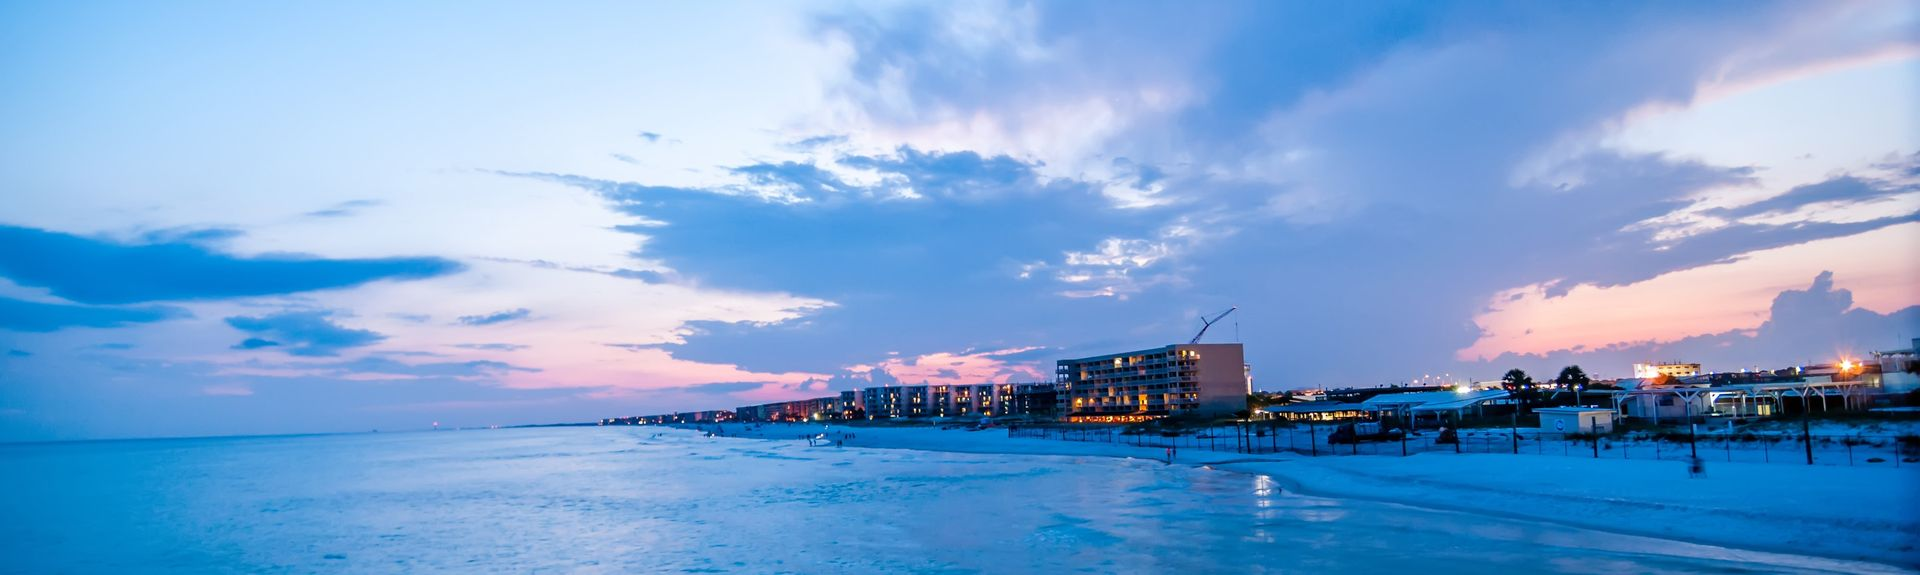 Fort Walton Beach, FL, USA